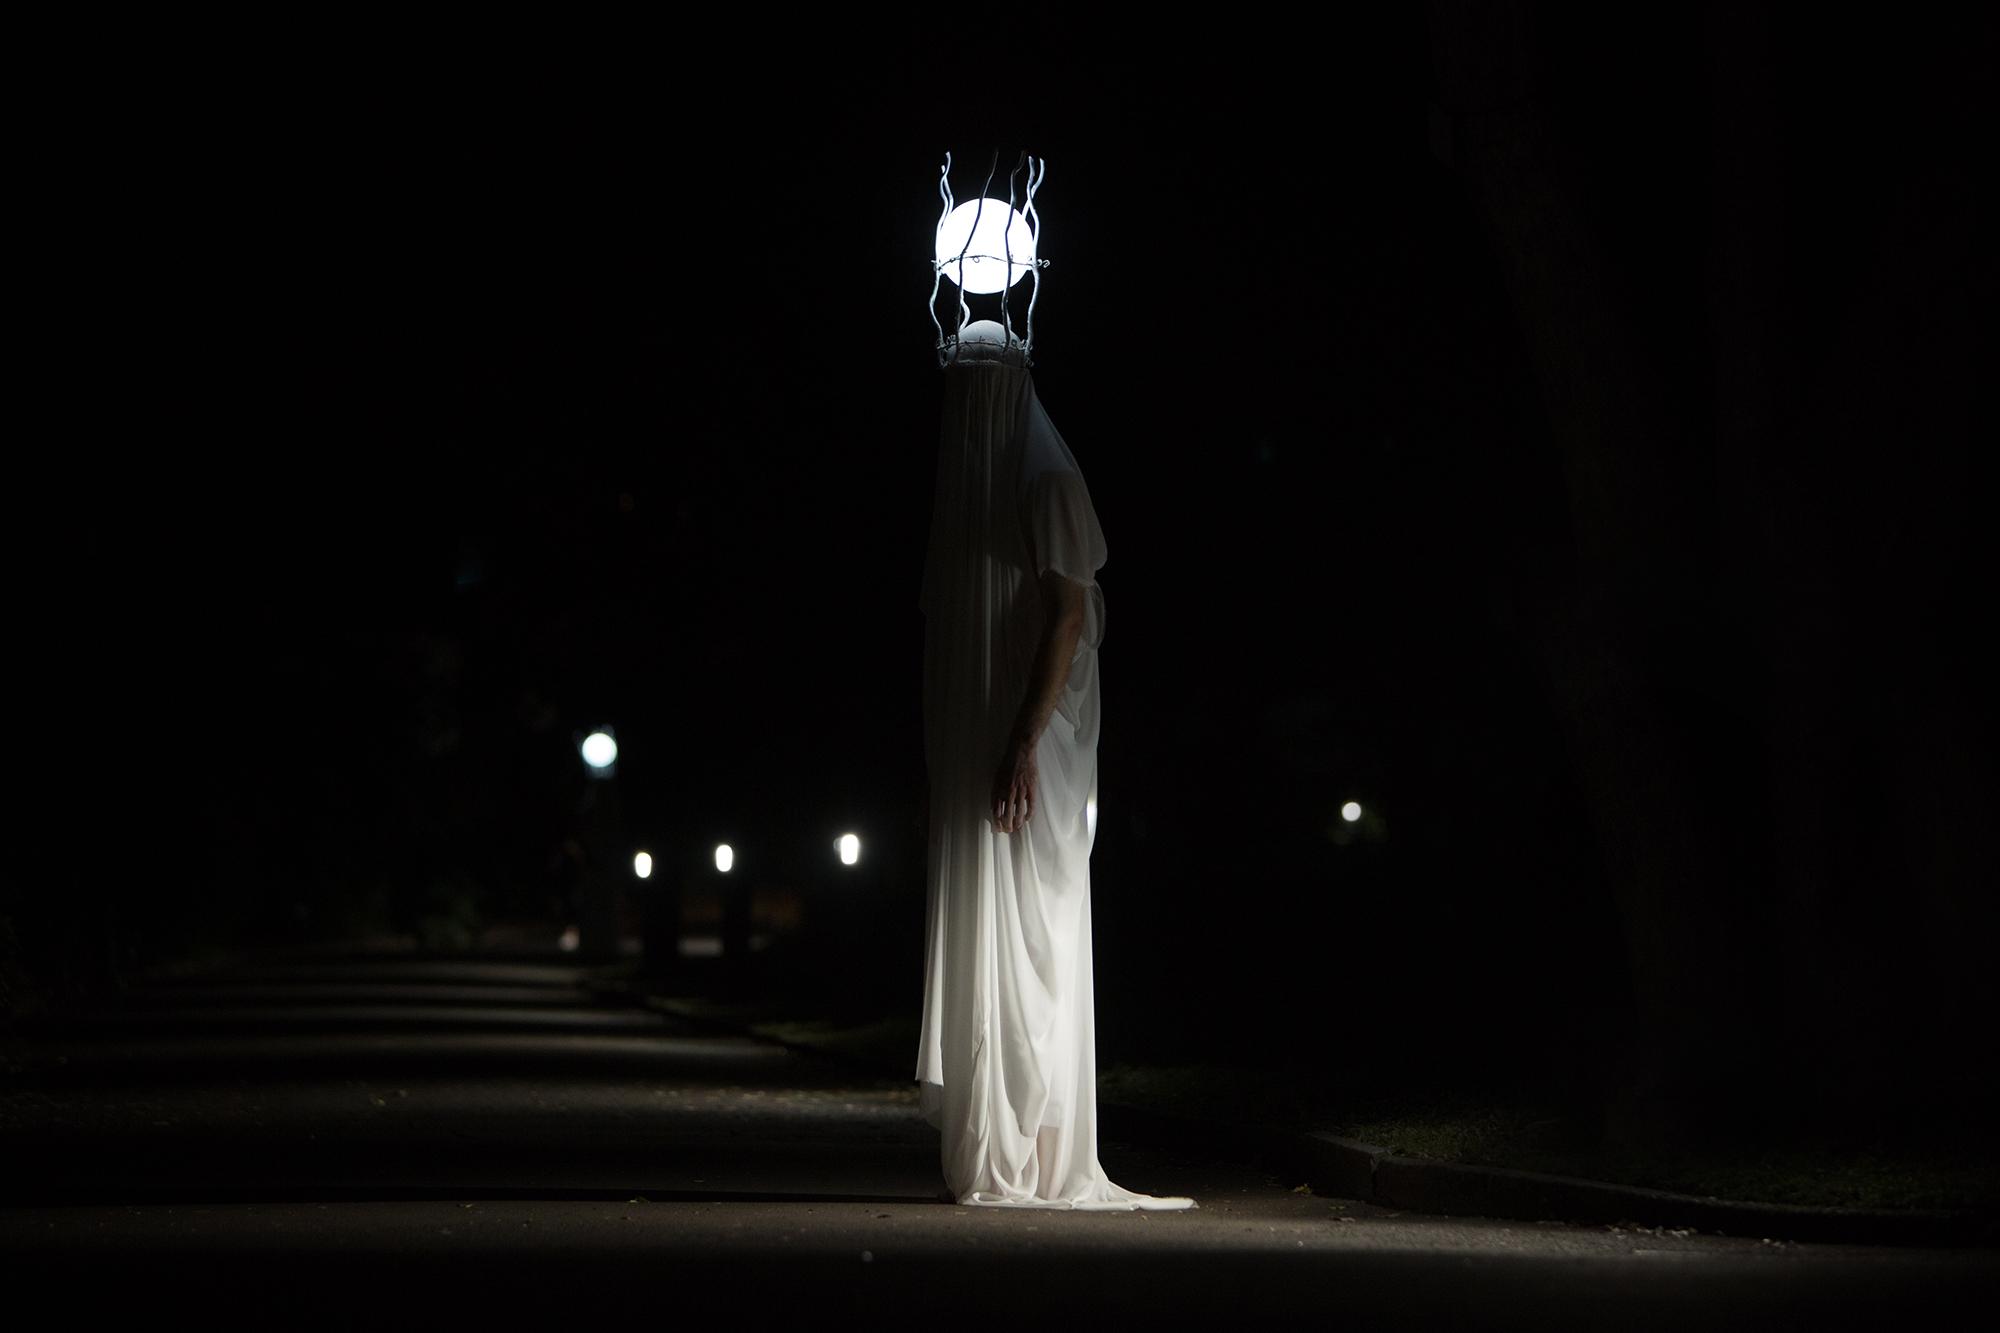 performer collaborator : Lee Searle l photography : Kathy Luu